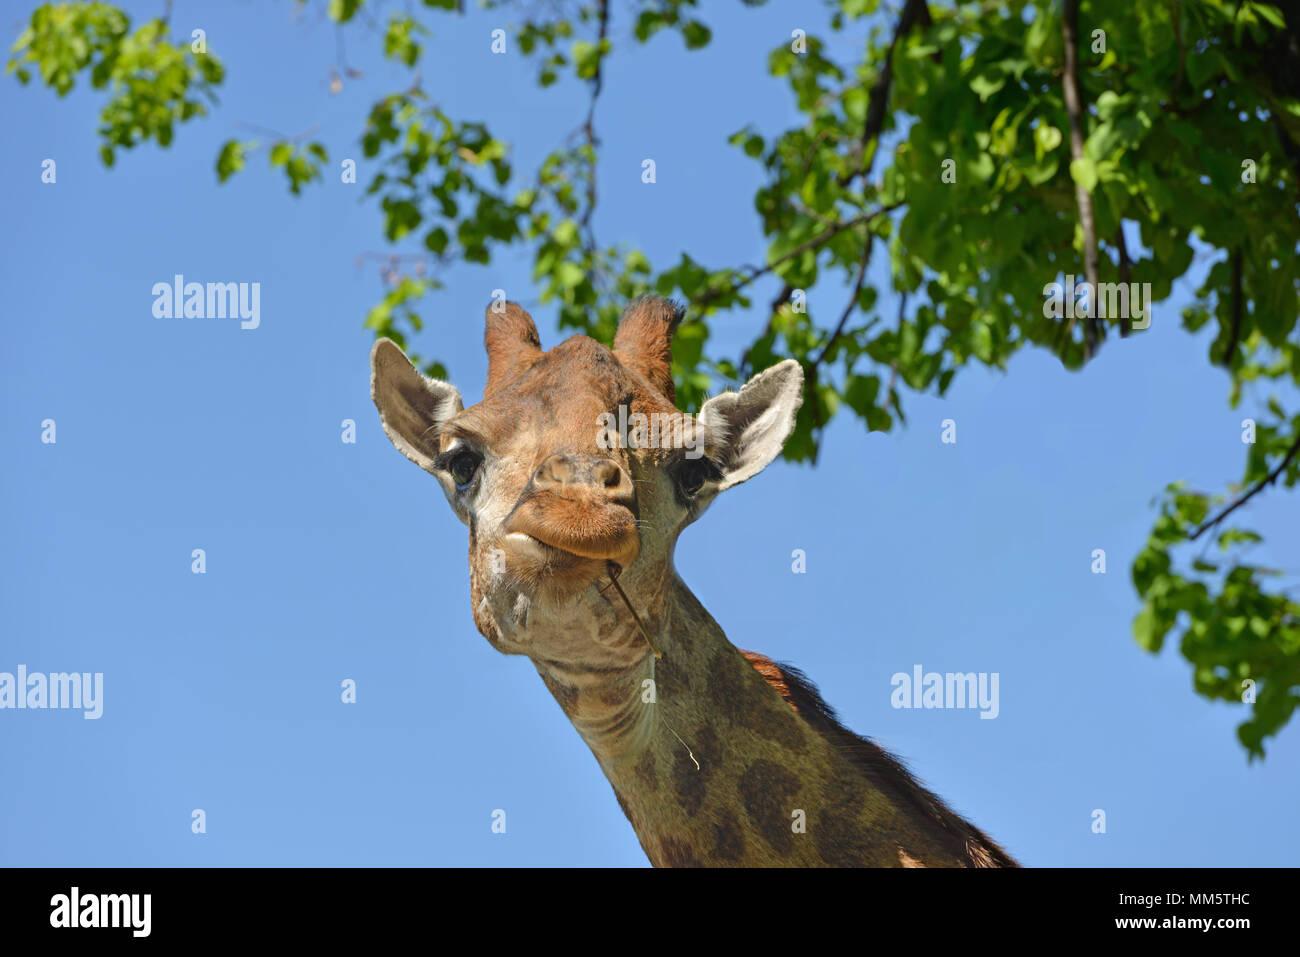 Girafe (Giraffa camelopardalis giraffa). Portrait Photo Stock